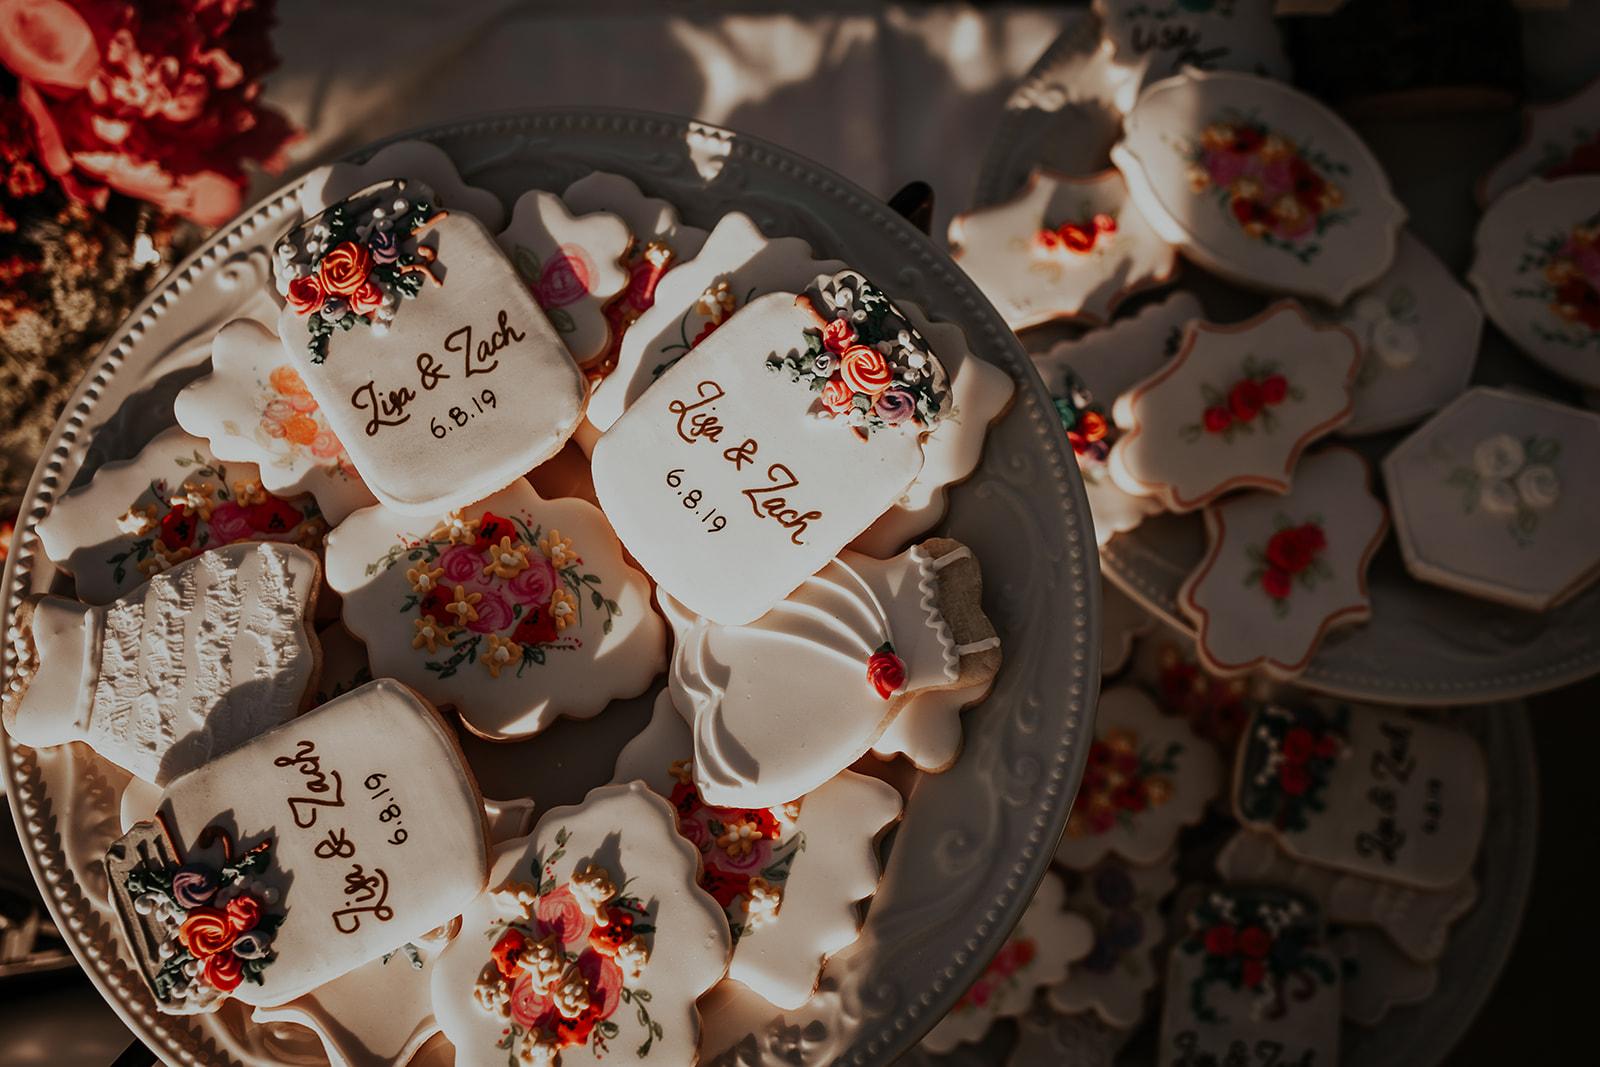 north-cascades-elopement-wedding-winthrop-wedding-photographer-megan-gallagher-photography (19).jpg